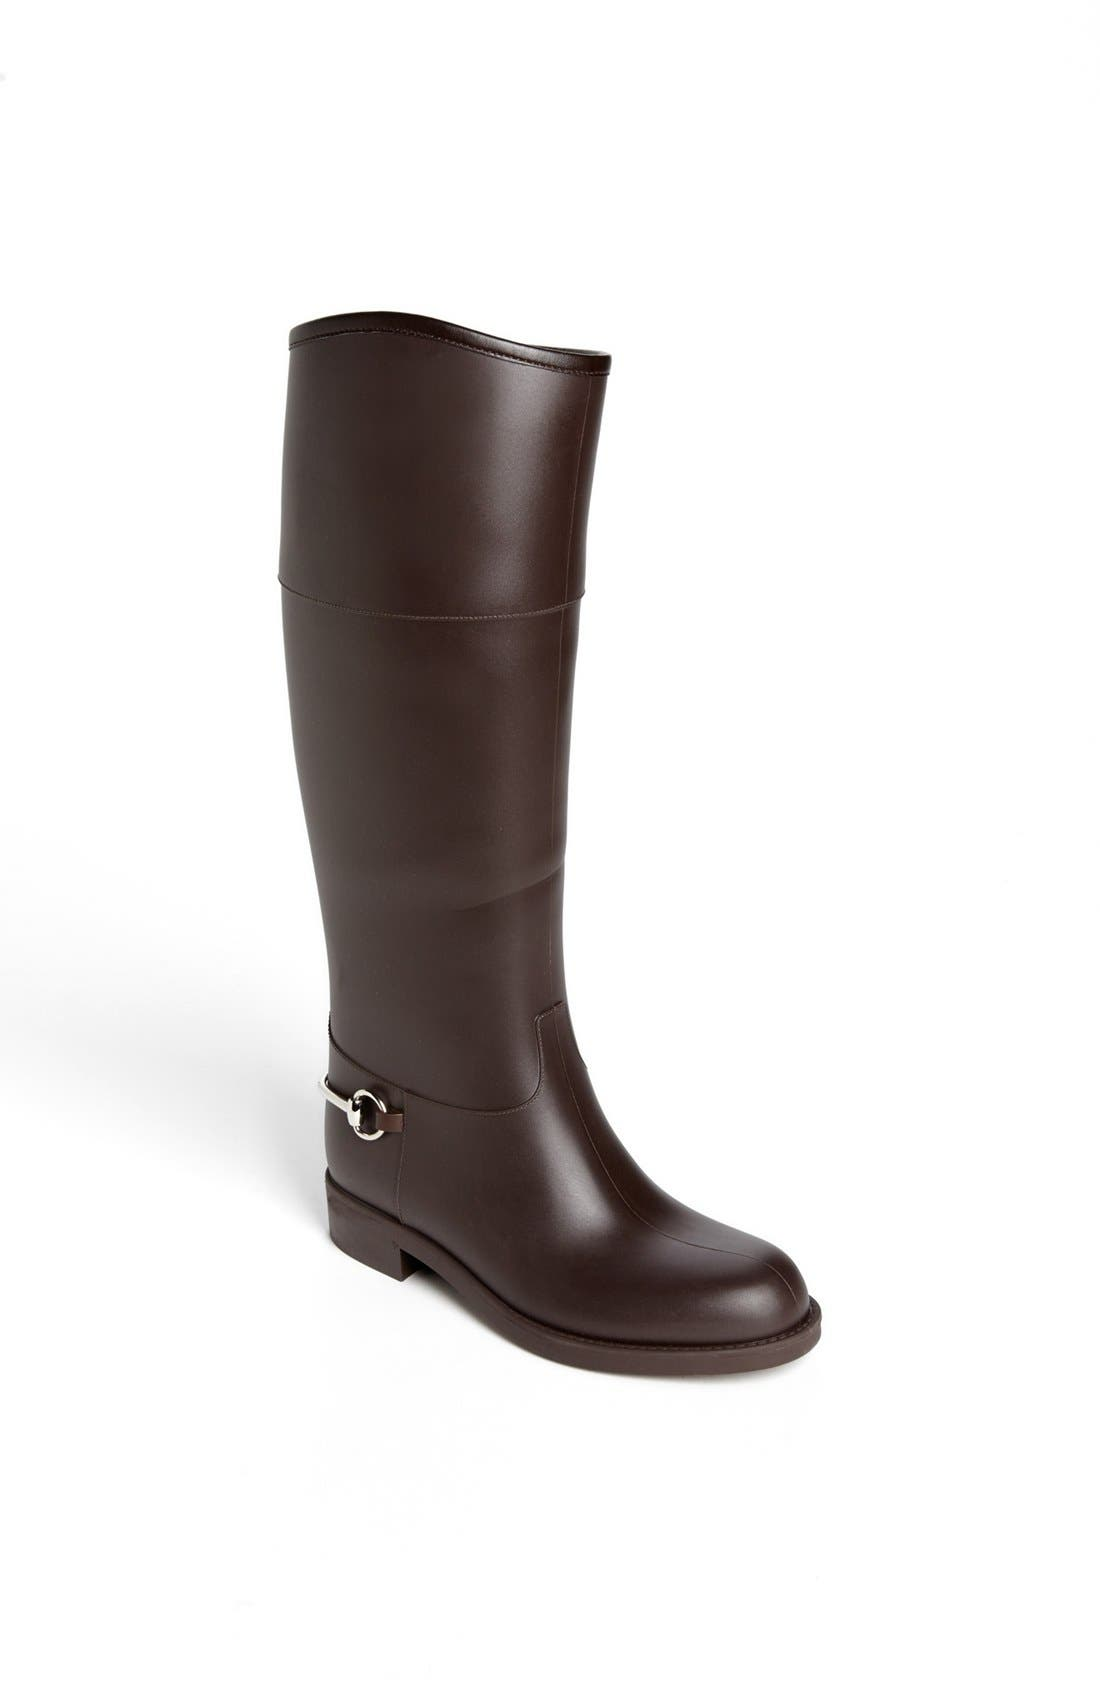 Alternate Image 1 Selected - Gucci Rubber Waterproof Rain Boot